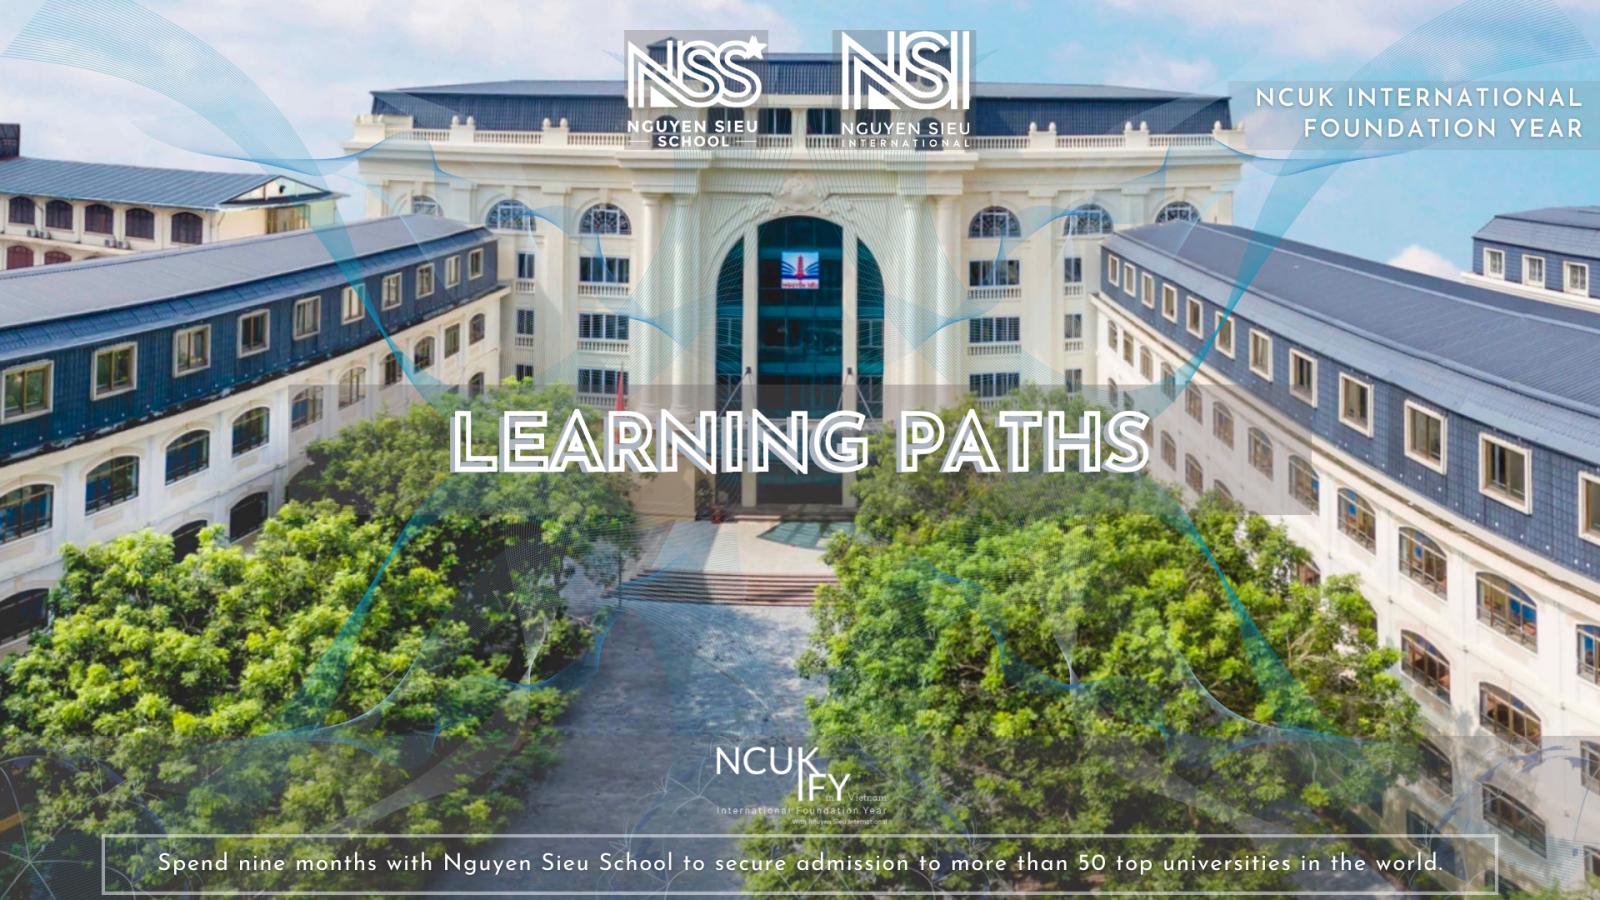 Learning Paths of the NCUK International Foundation Year at Nguyen Sieu School